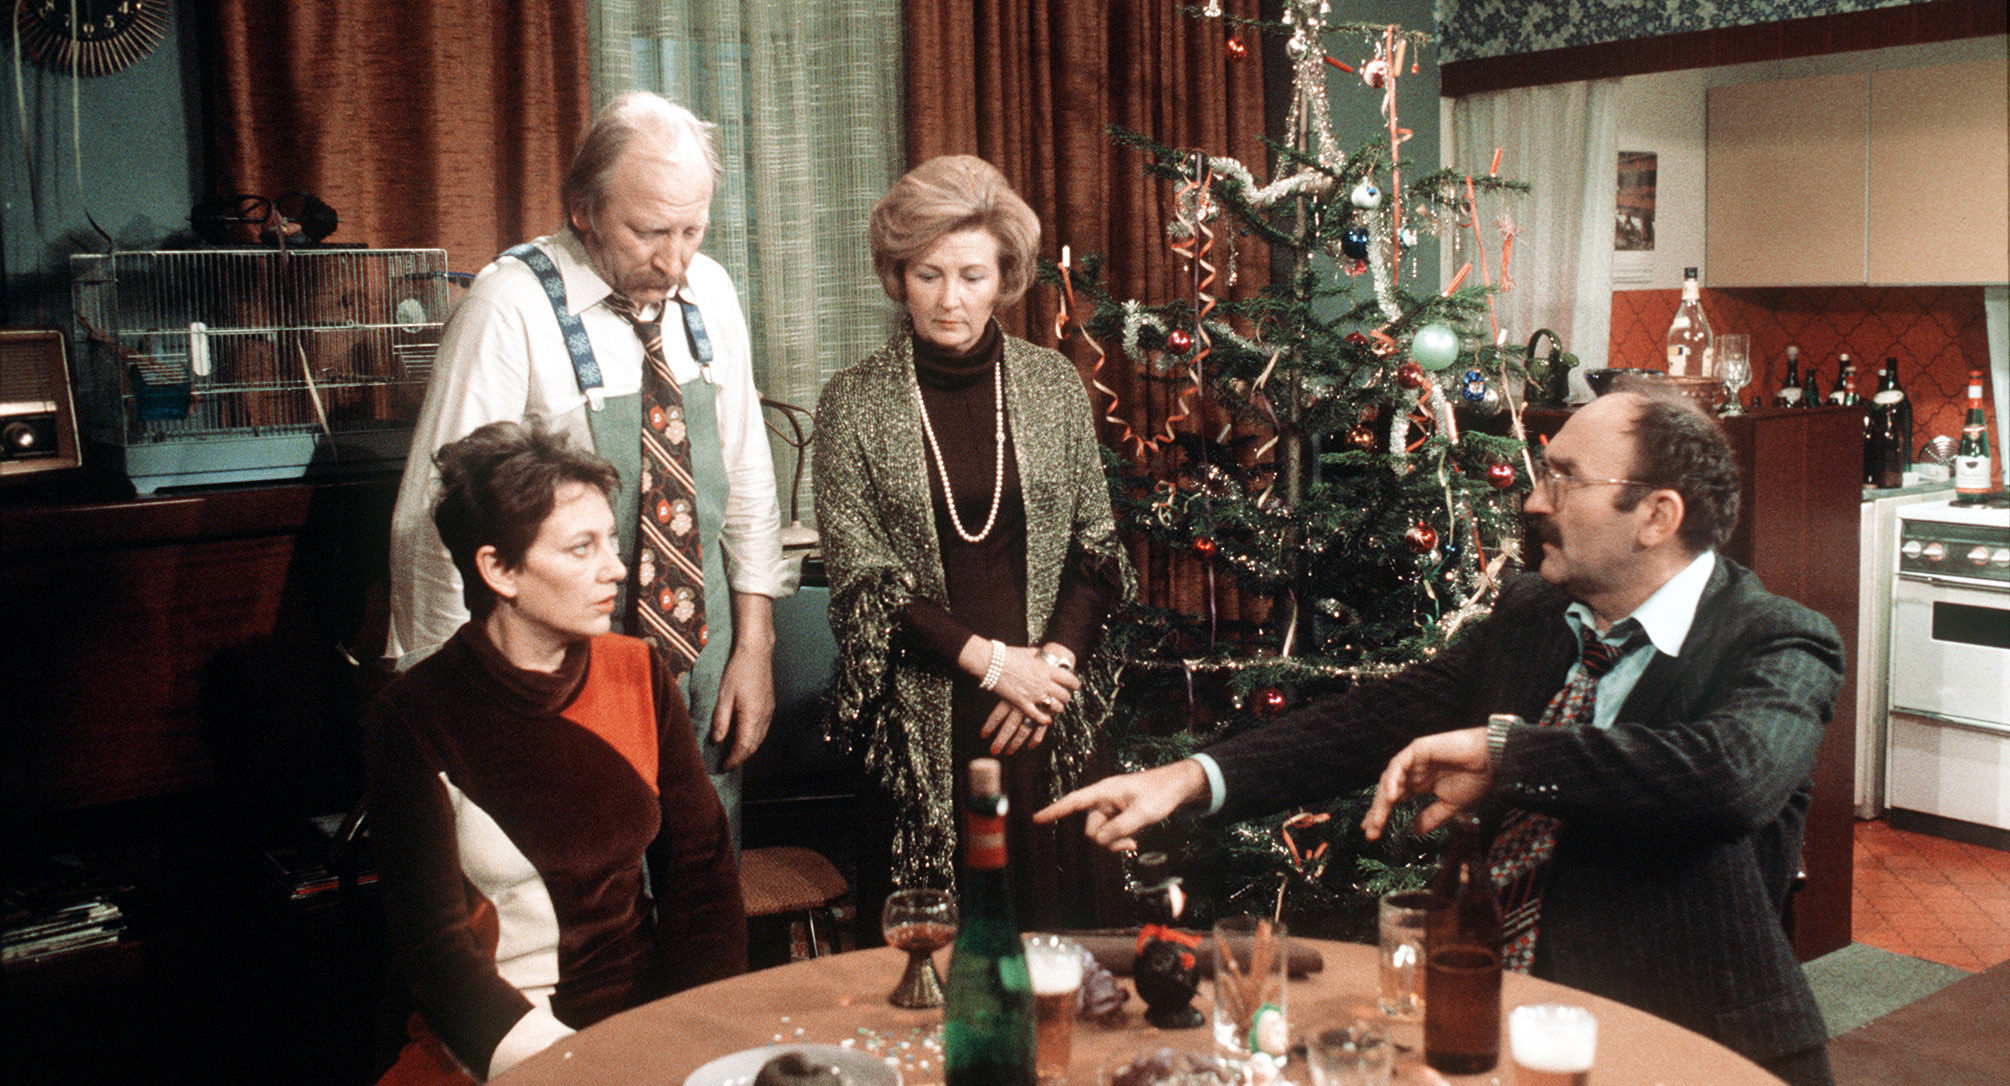 Toni (Ingrid Burkhard), Mundl (Karl Merkatz), Martha Werner (Ilse Hanel), Herr Werner (Jaromír Borek)